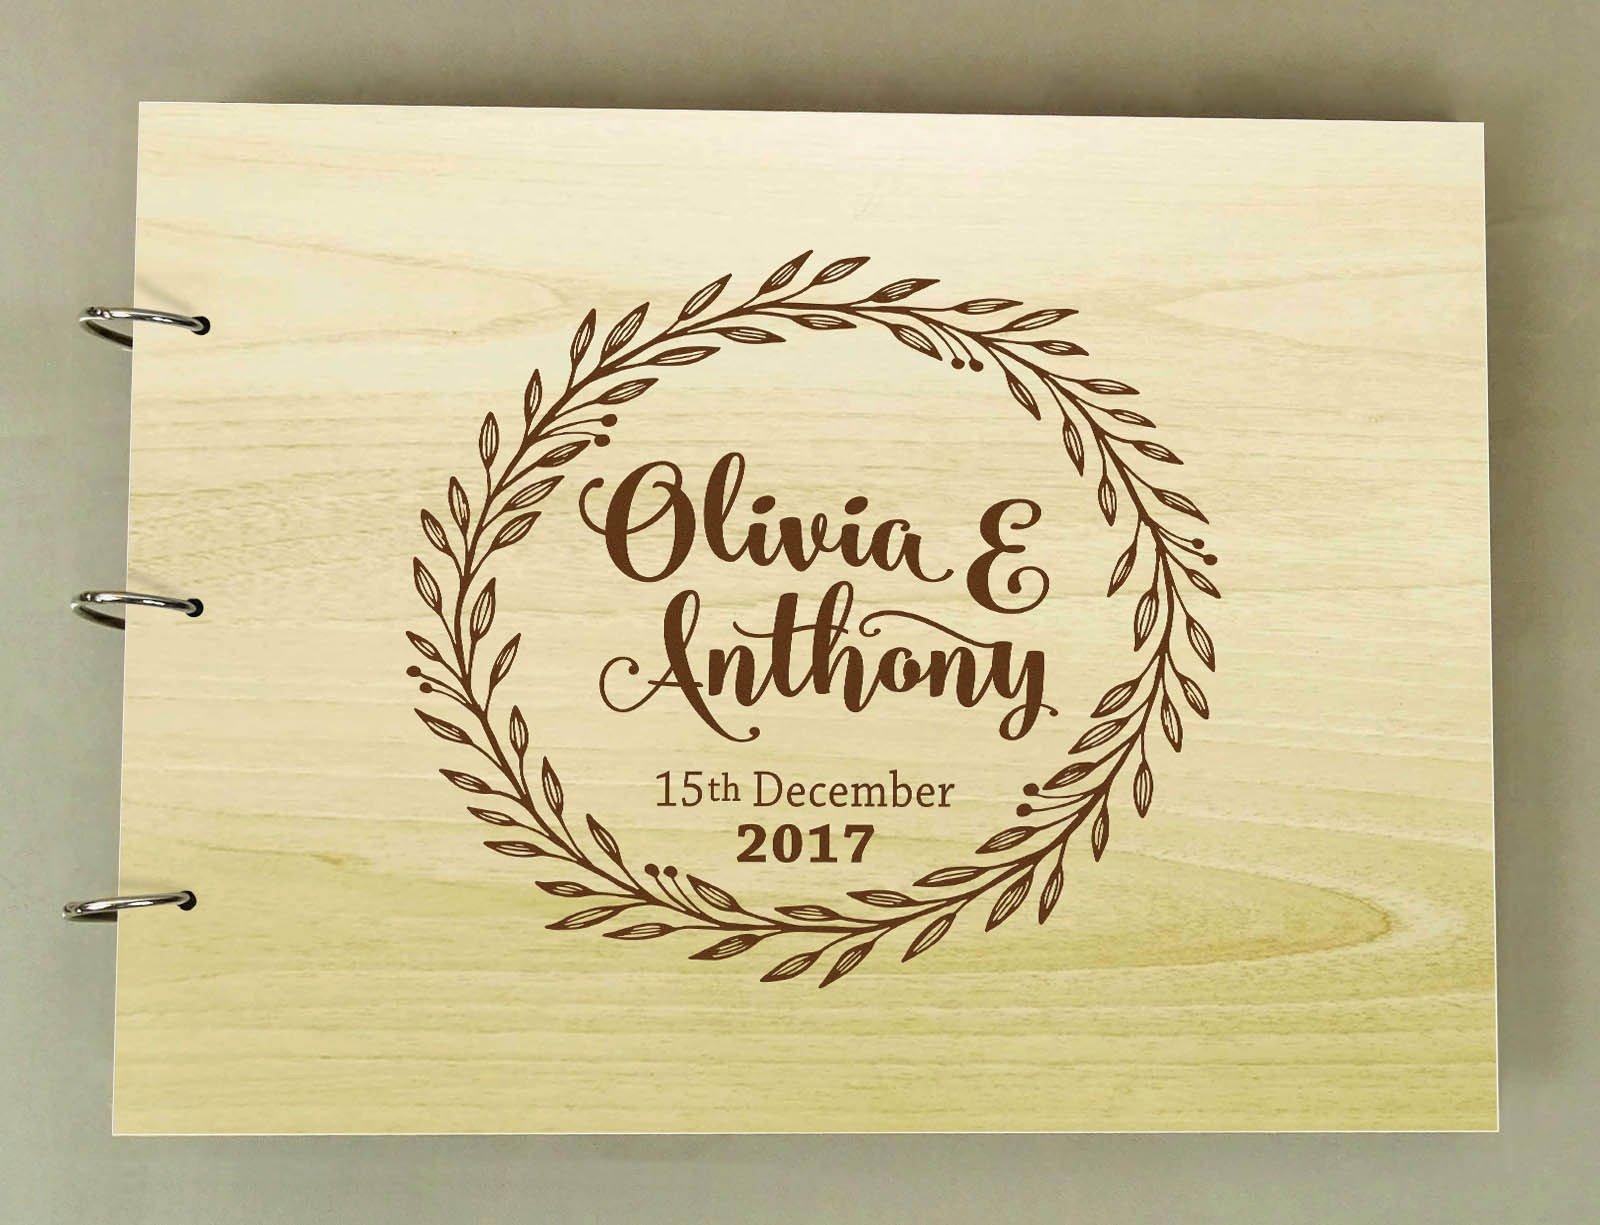 Handmade Custom Guest Book Rustic Wedding Wood Engraved Advice Book Photo Album Personalized Scrapbook